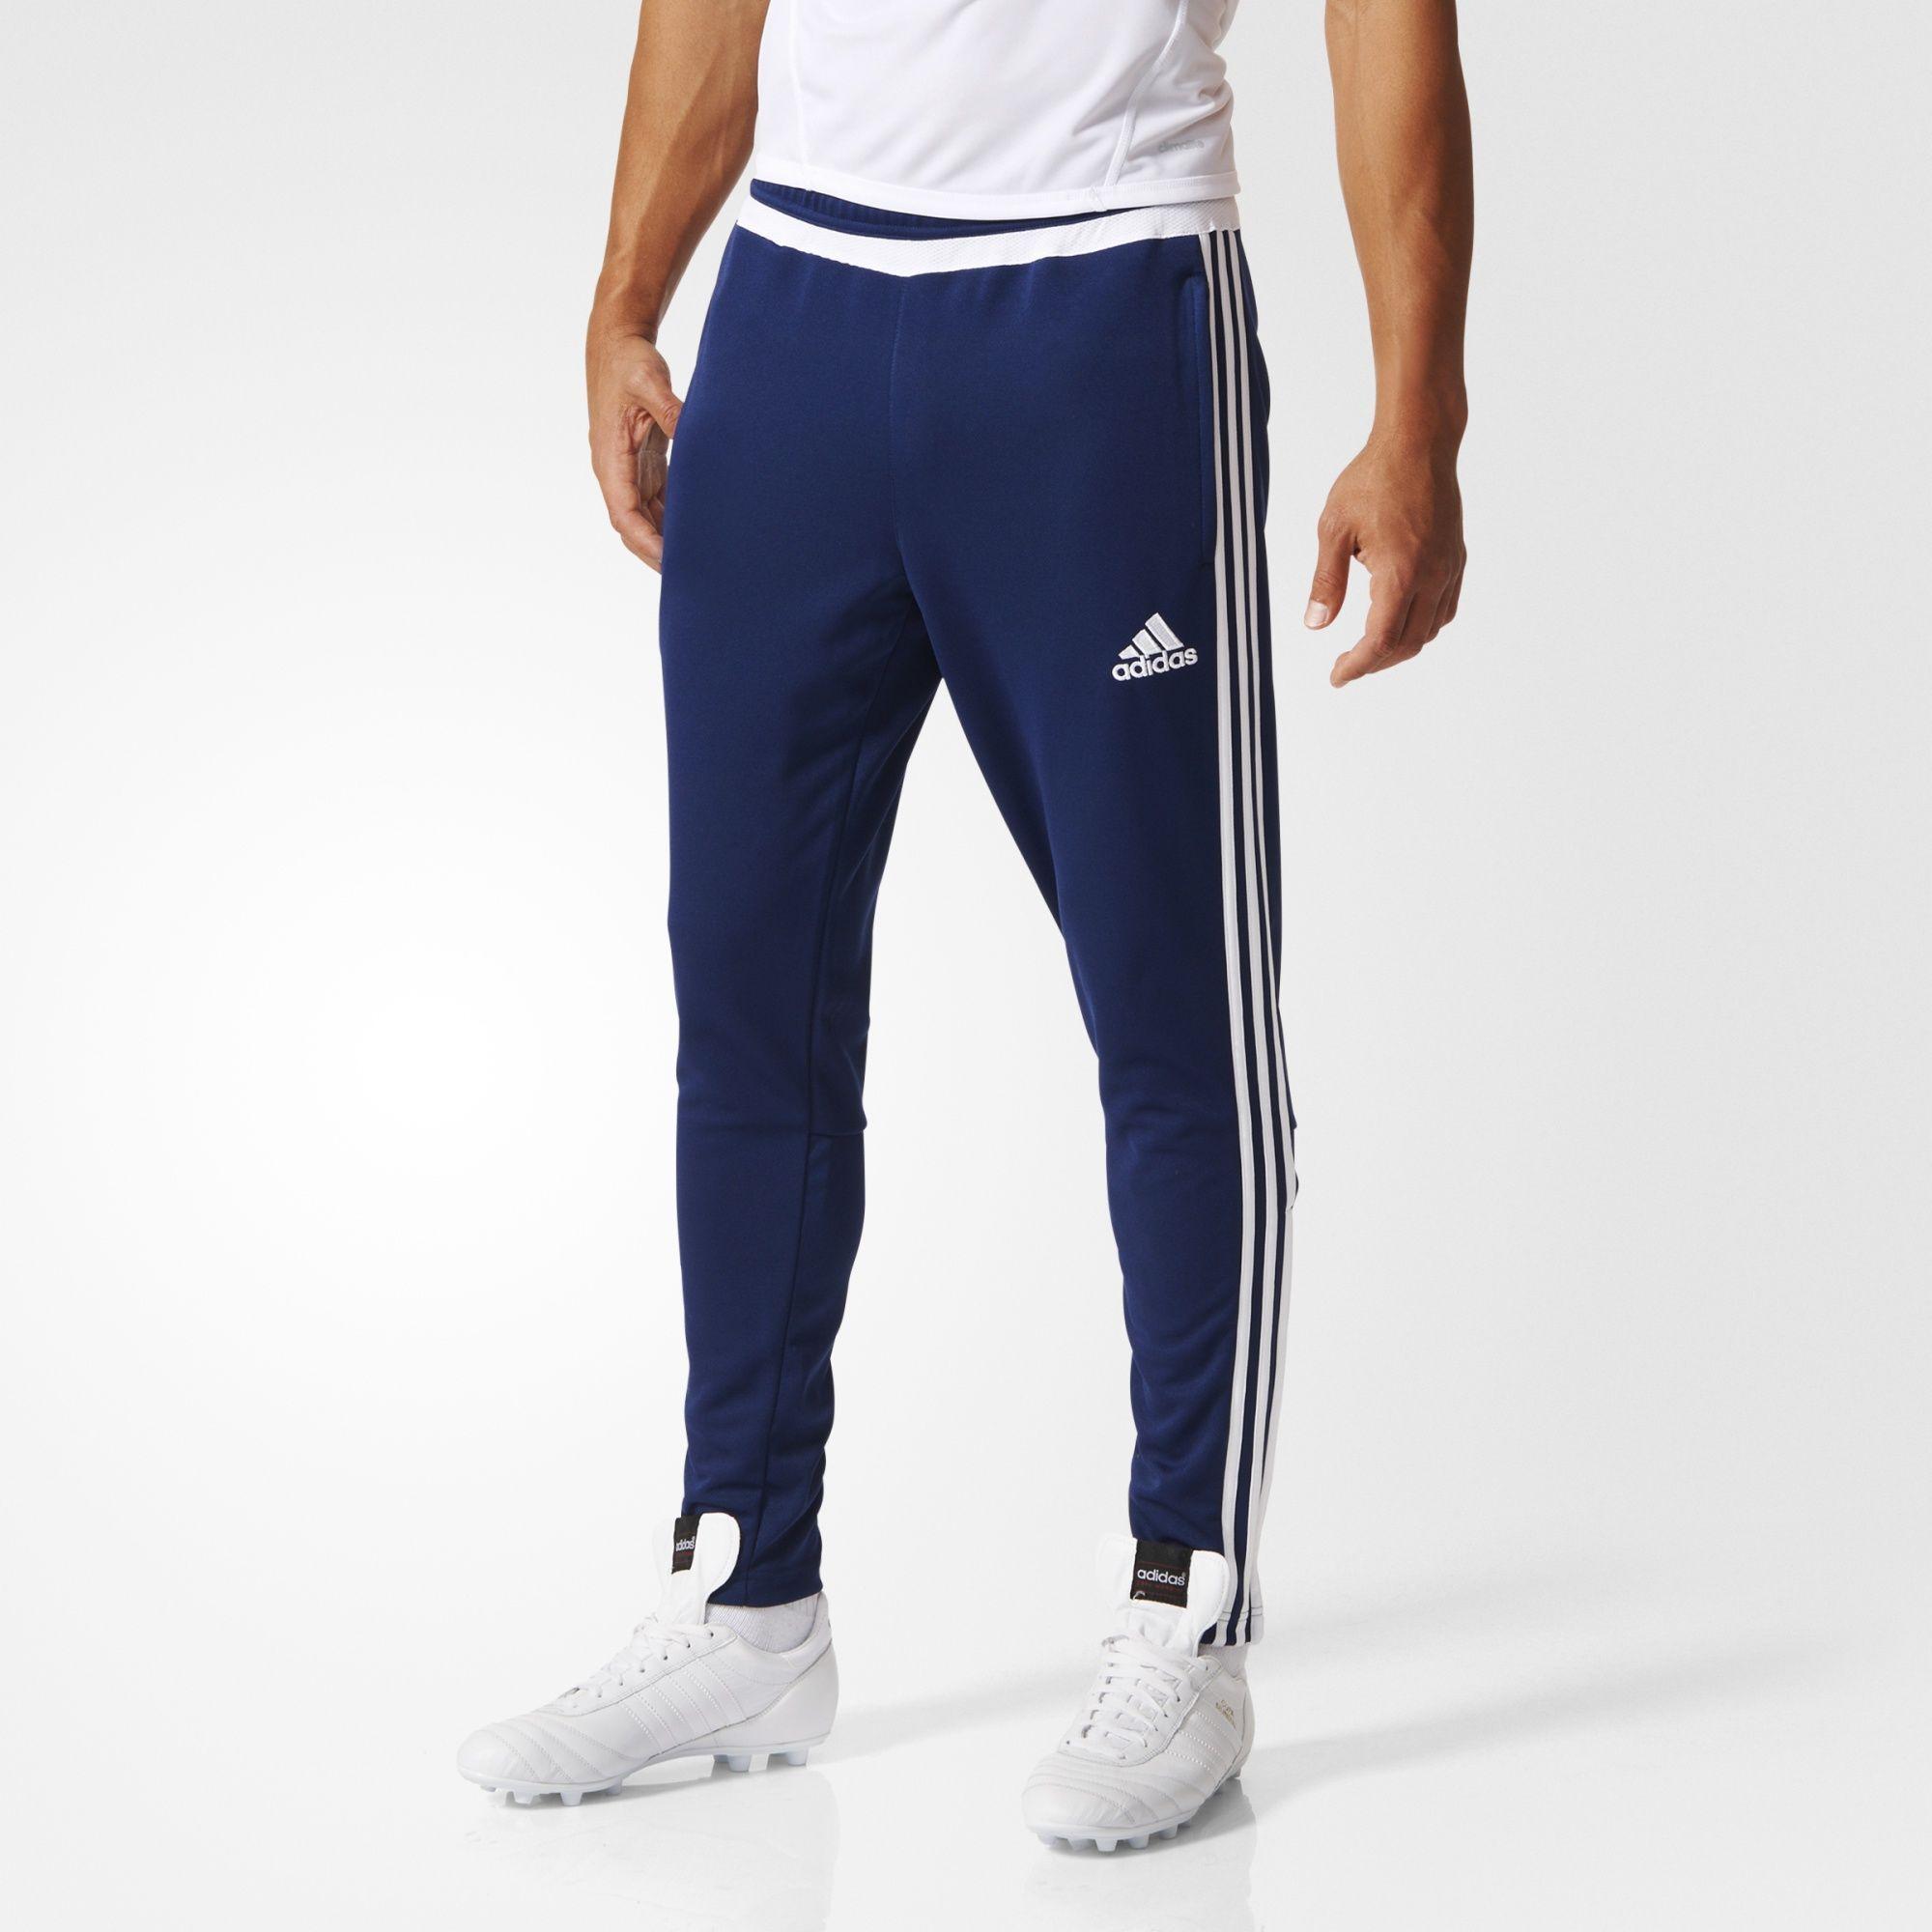 adidas - Tiro15 Training Pants